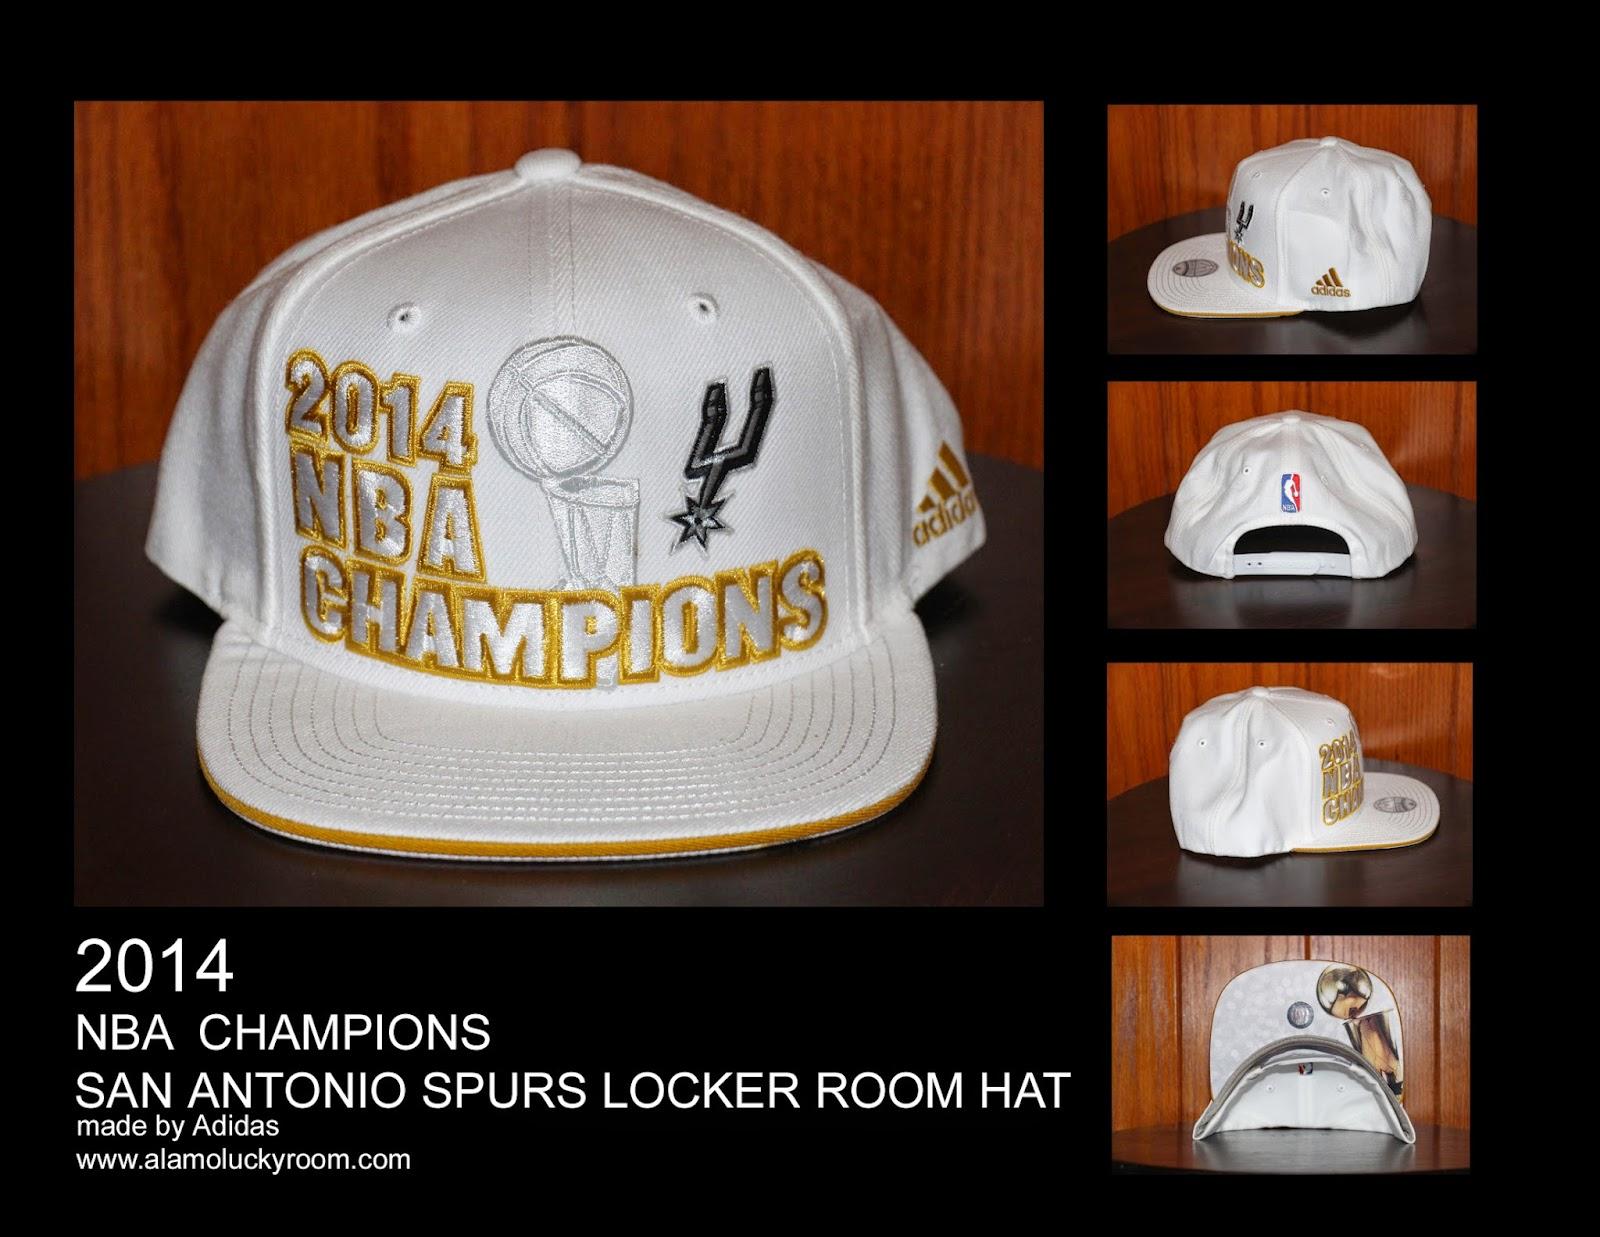 c7ae4e71085 Alamo Lucky Room  2014 San Antonio Spurs NBA Champions Locker Room Hat